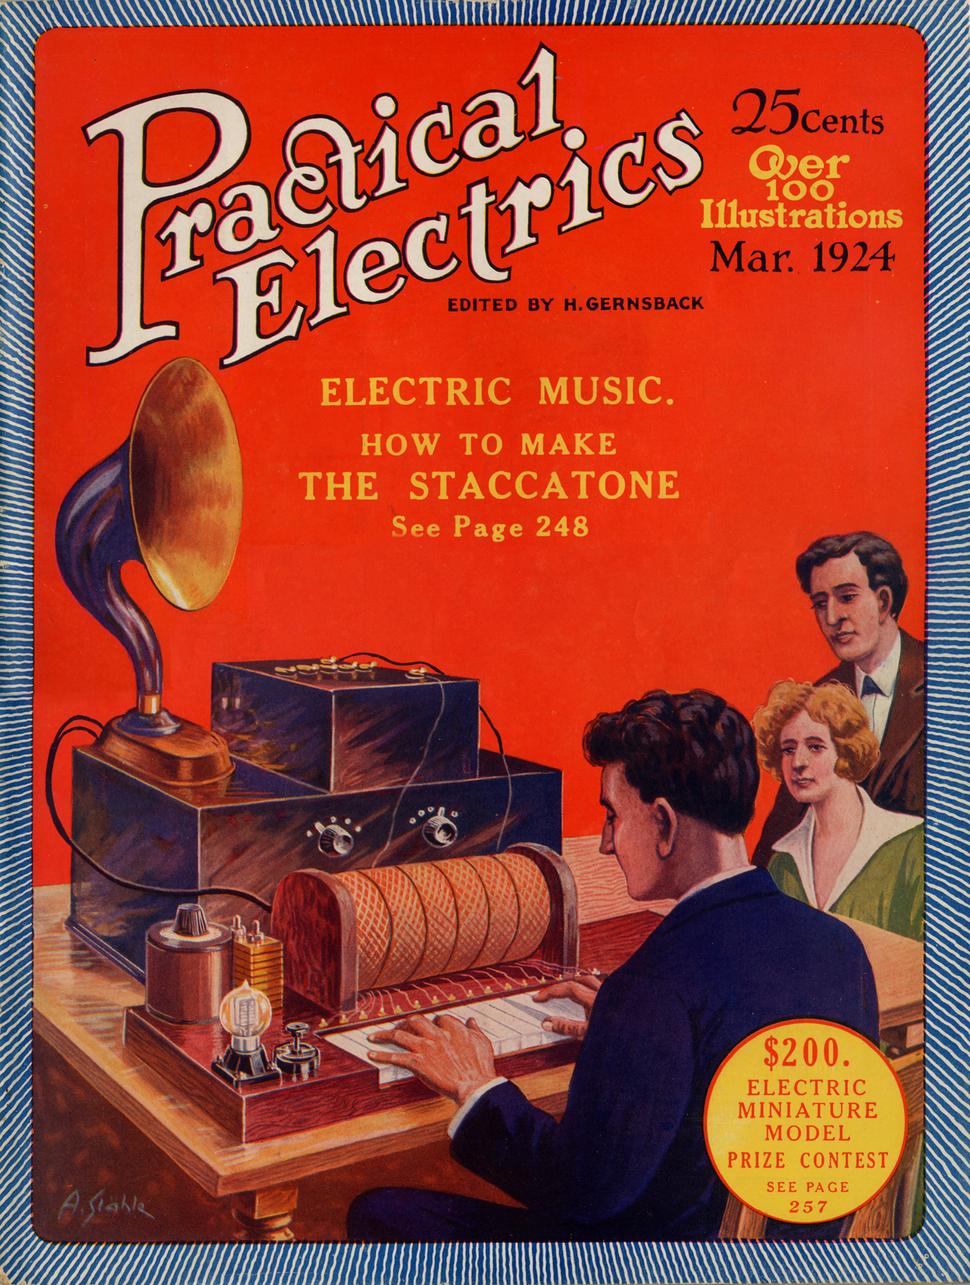 Practical Electrics Mar 1924 Cover